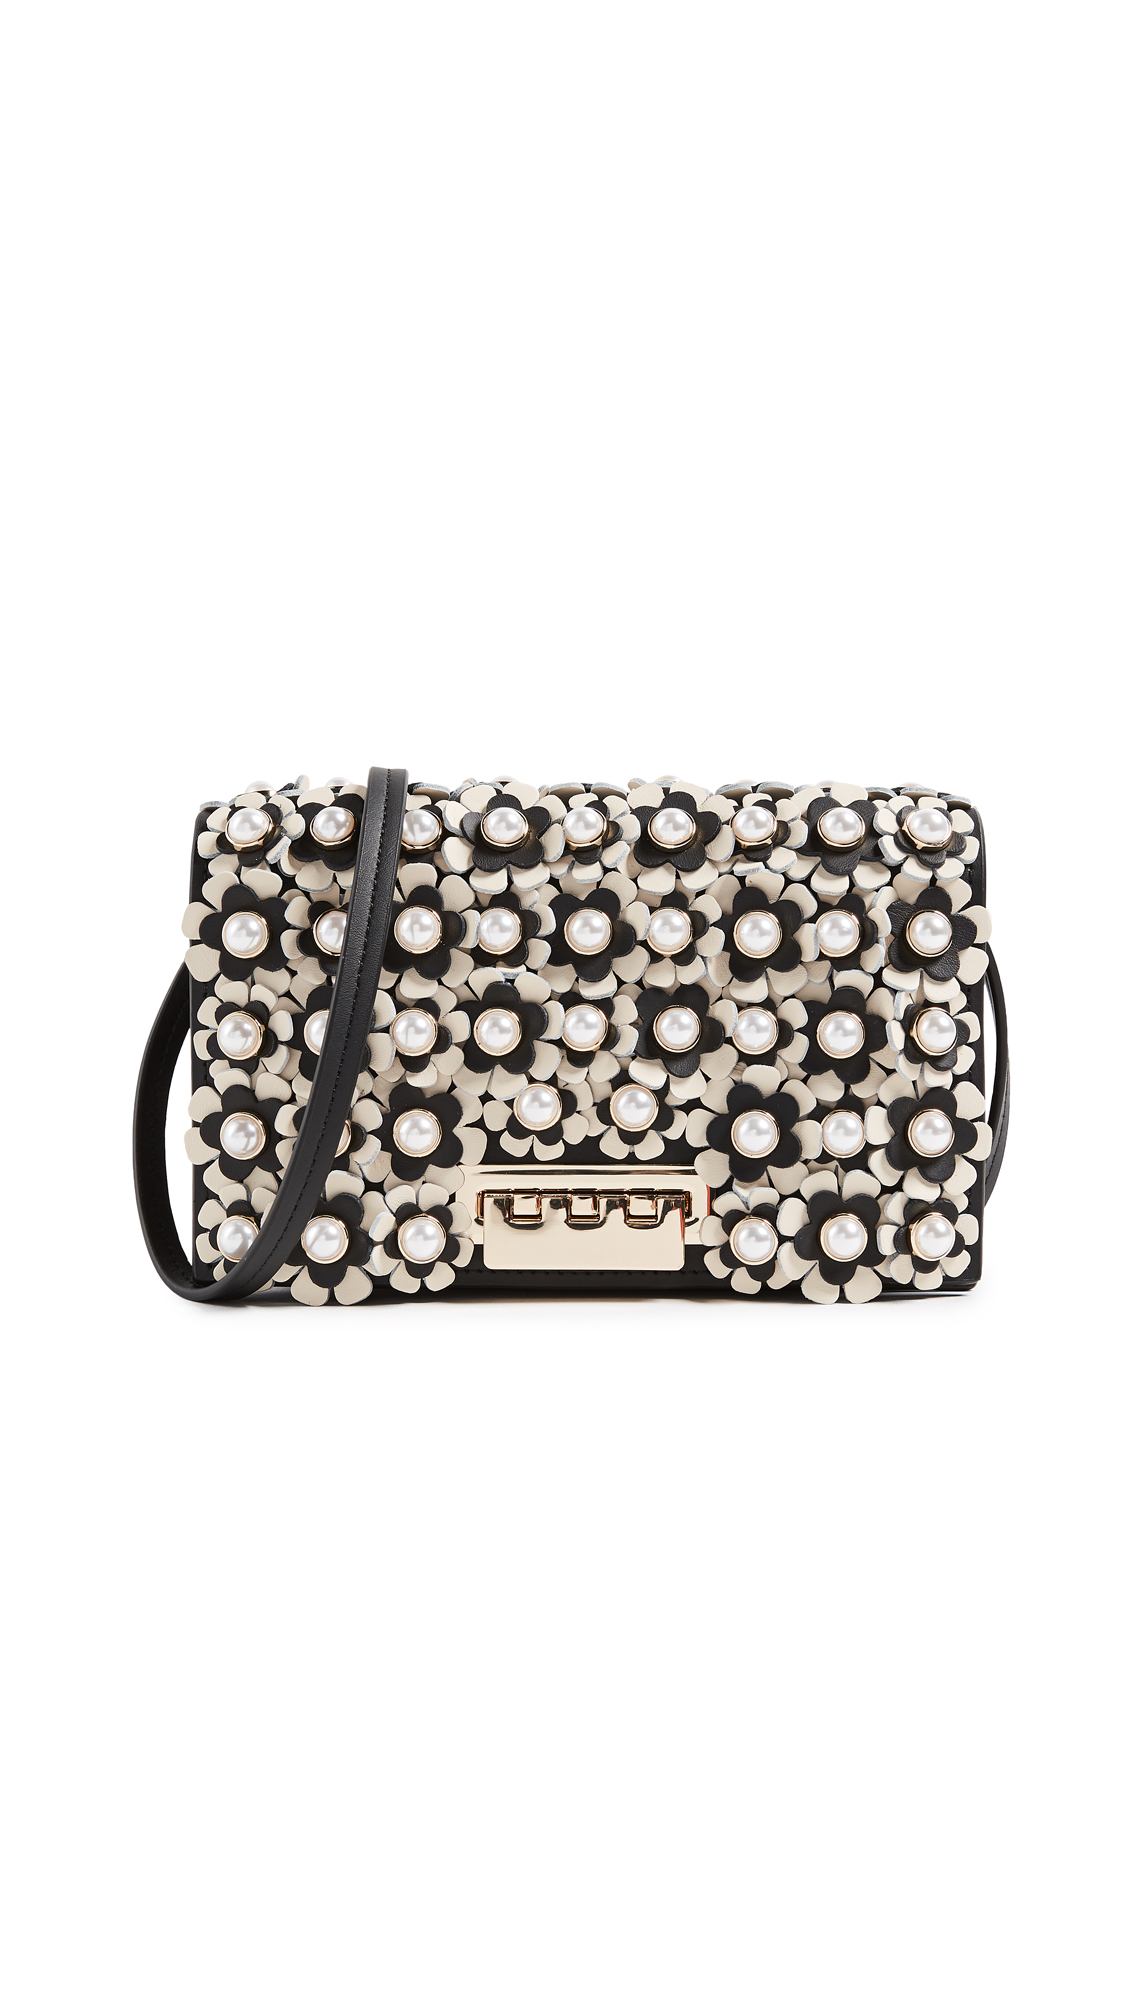 ZAC Zac Posen Earthette Floral Cross Body Bag - Black/Ivory